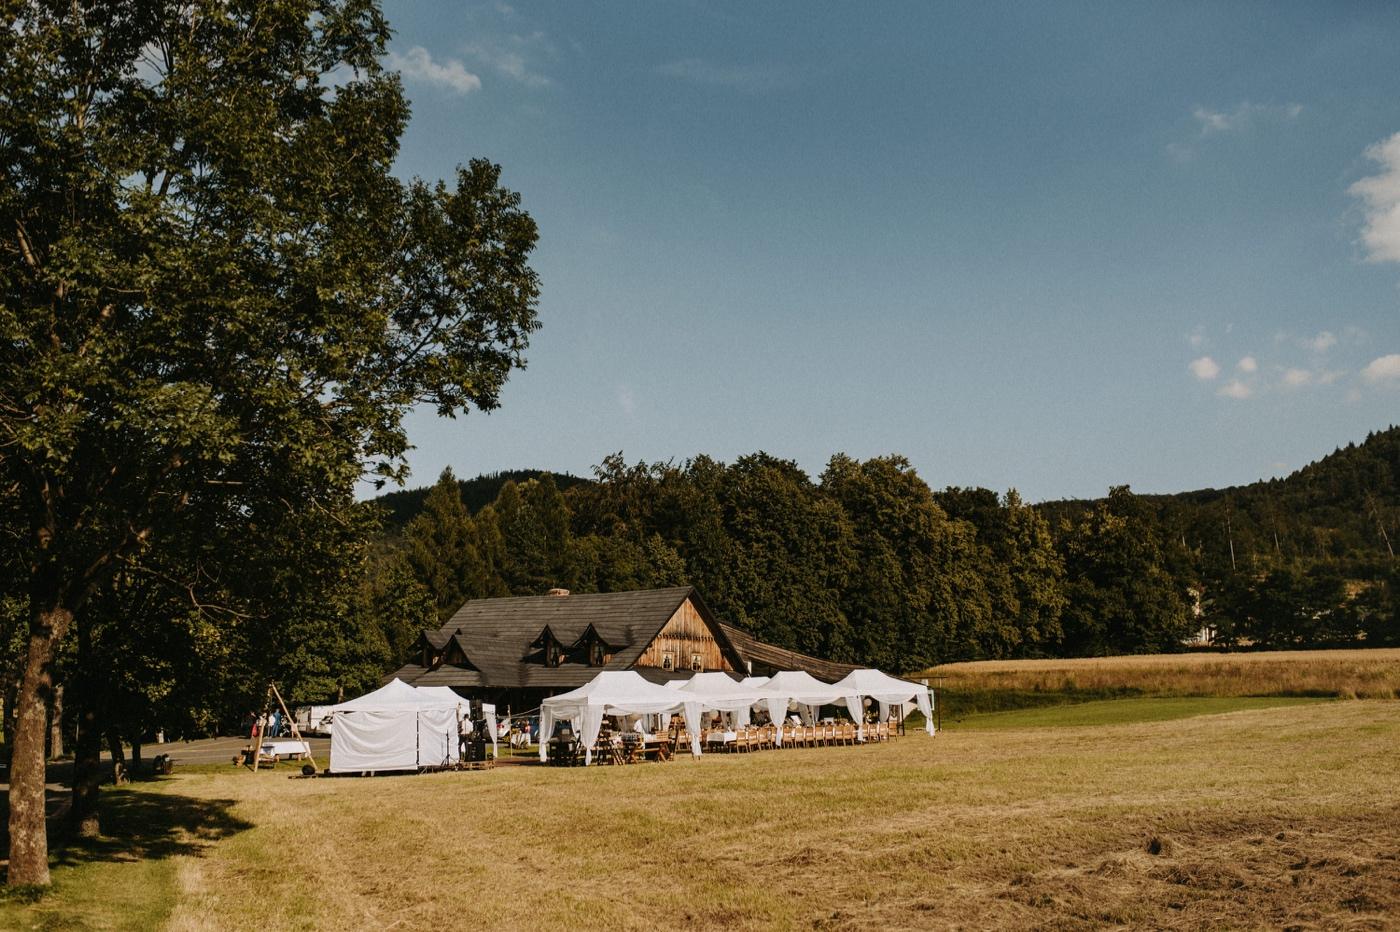 wesele pod namiotami w górach